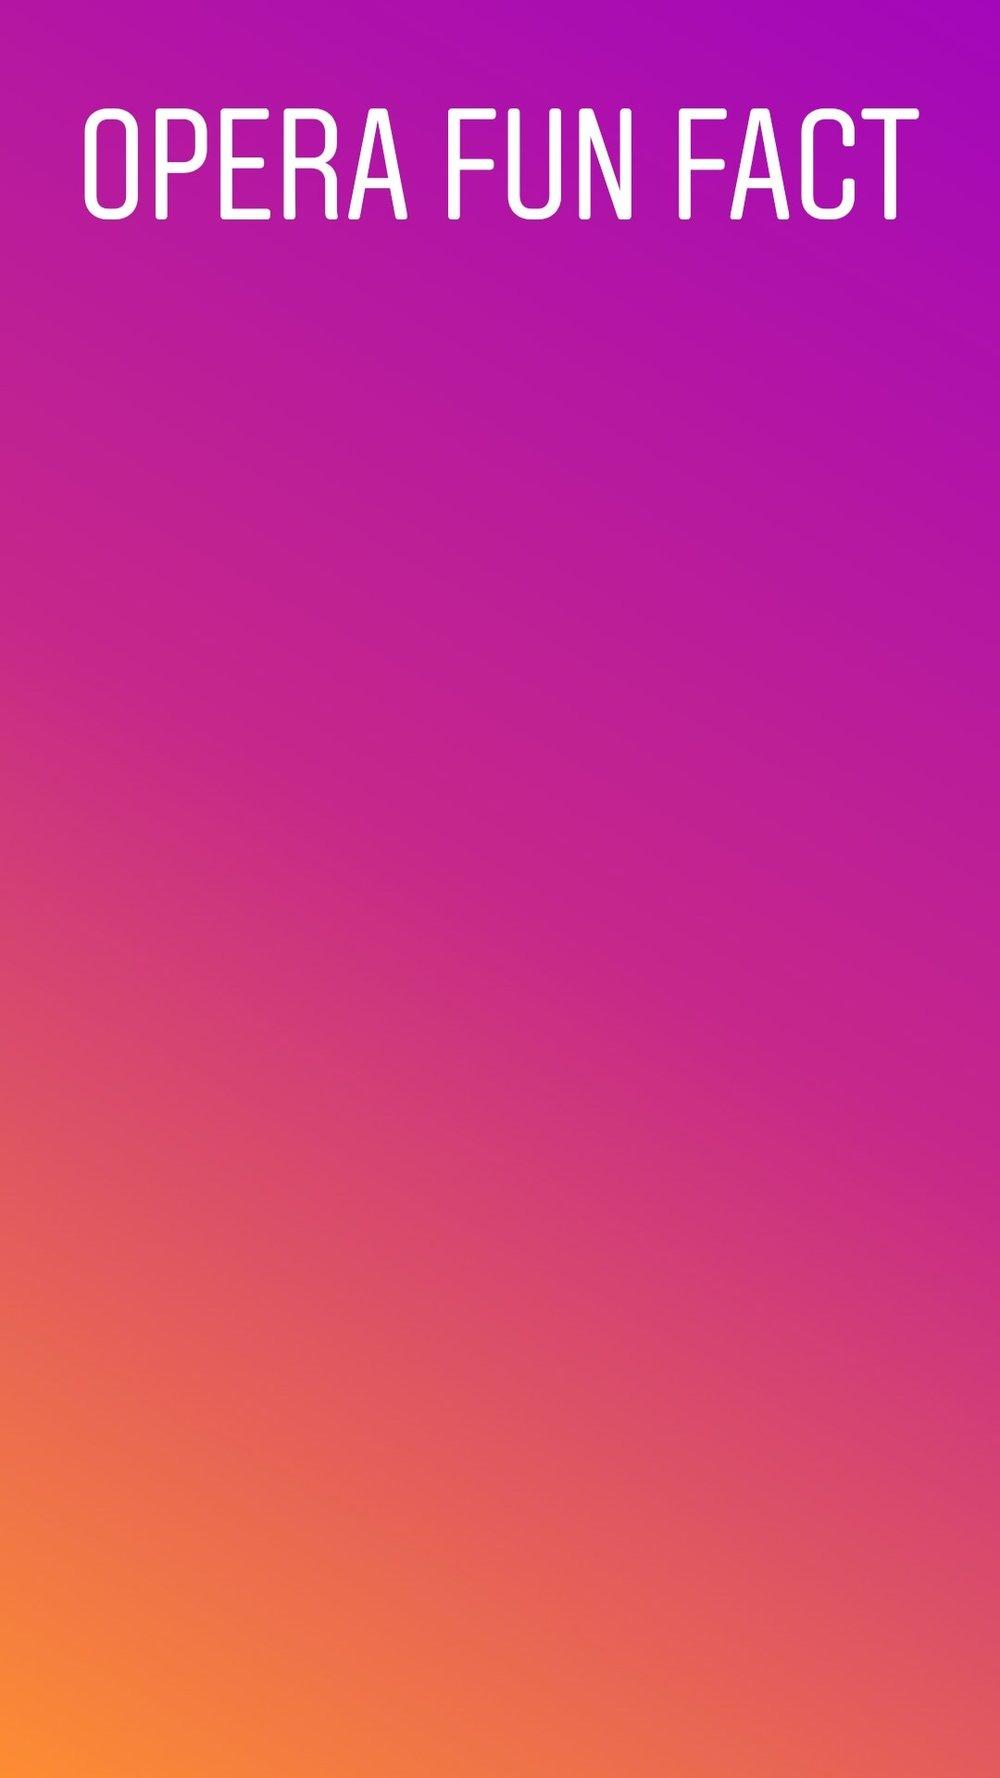 IMG_20180428_133043_707.jpg